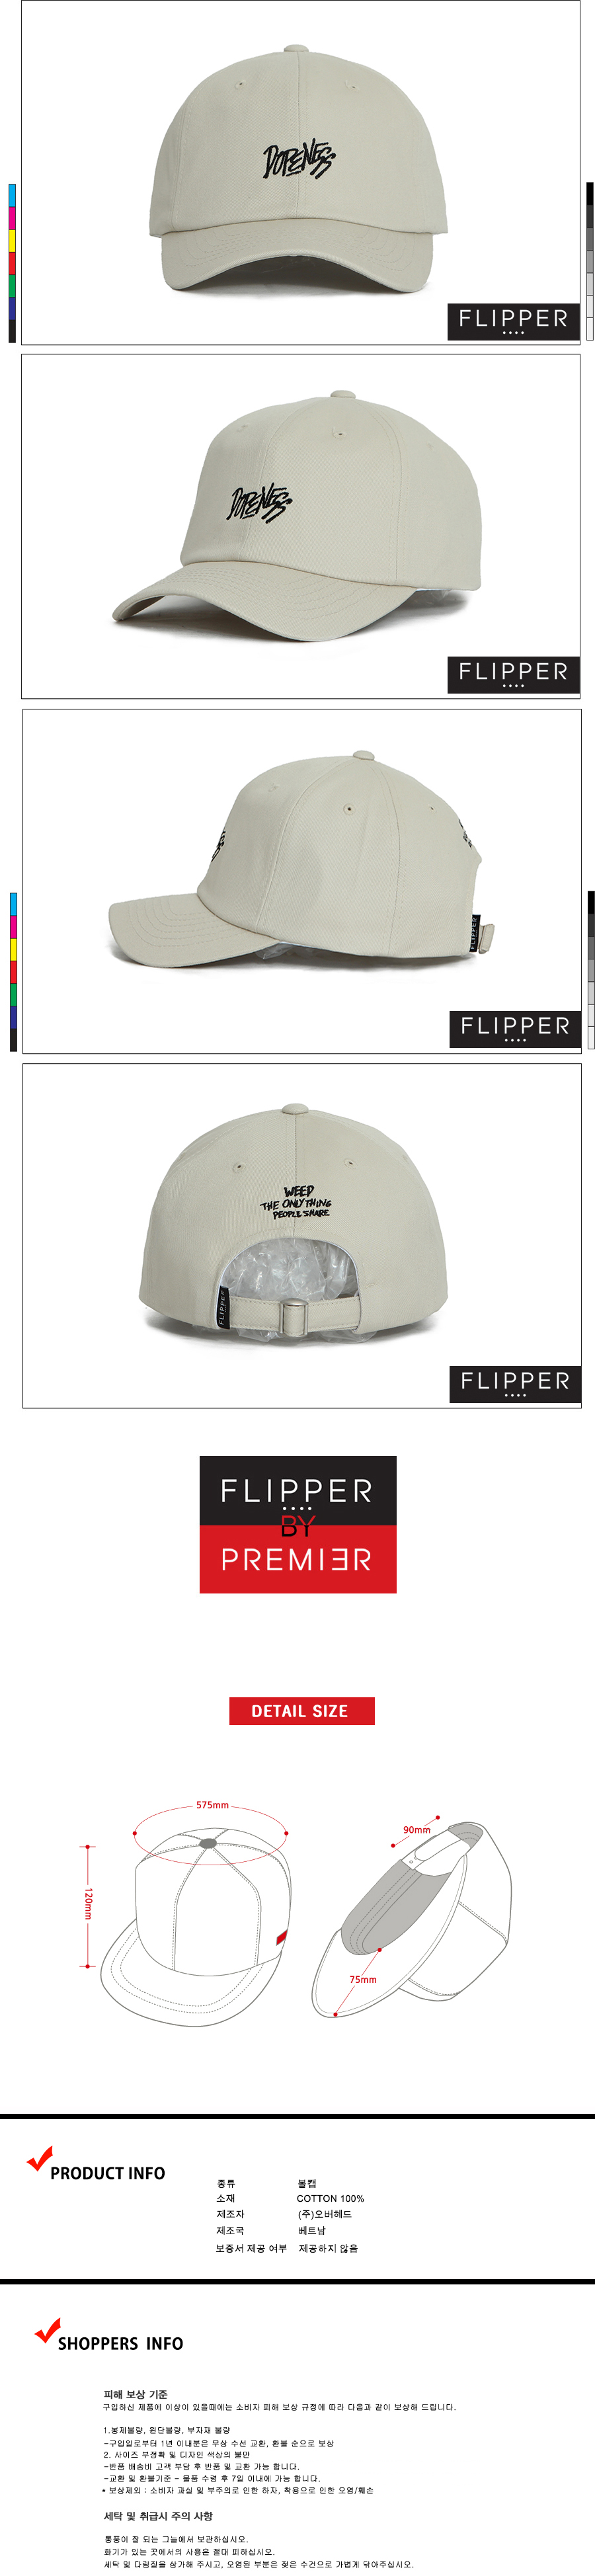 [ PREMIER ] [卓越]翻转球帽 Dopeness 米色(FL098)